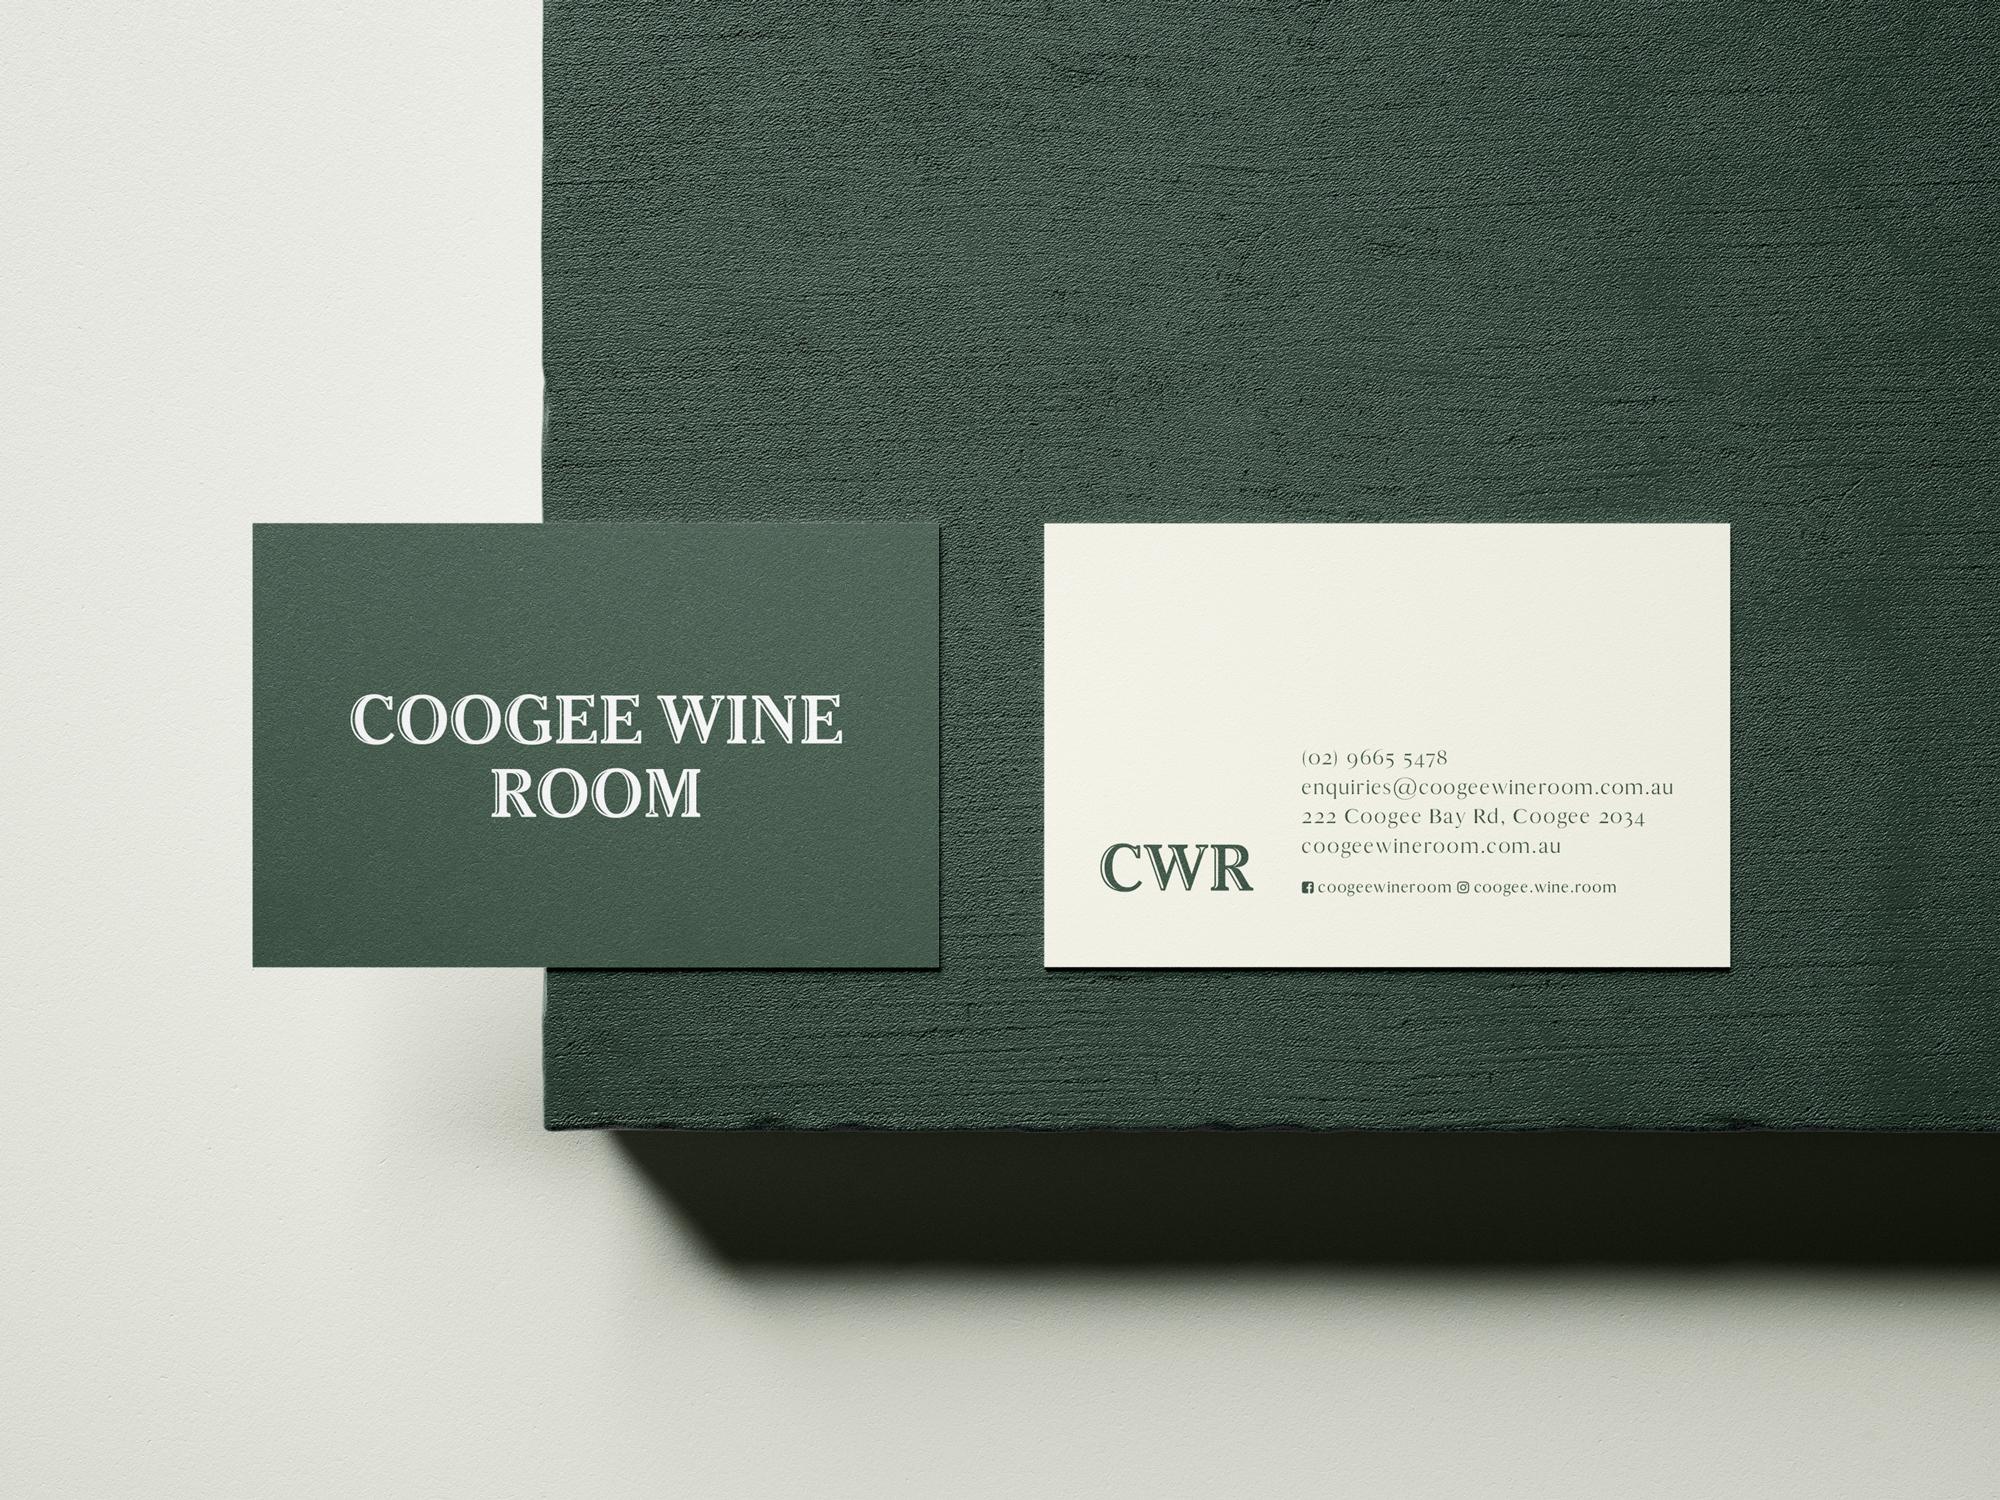 sydney design social coogee wine room logo branding business card